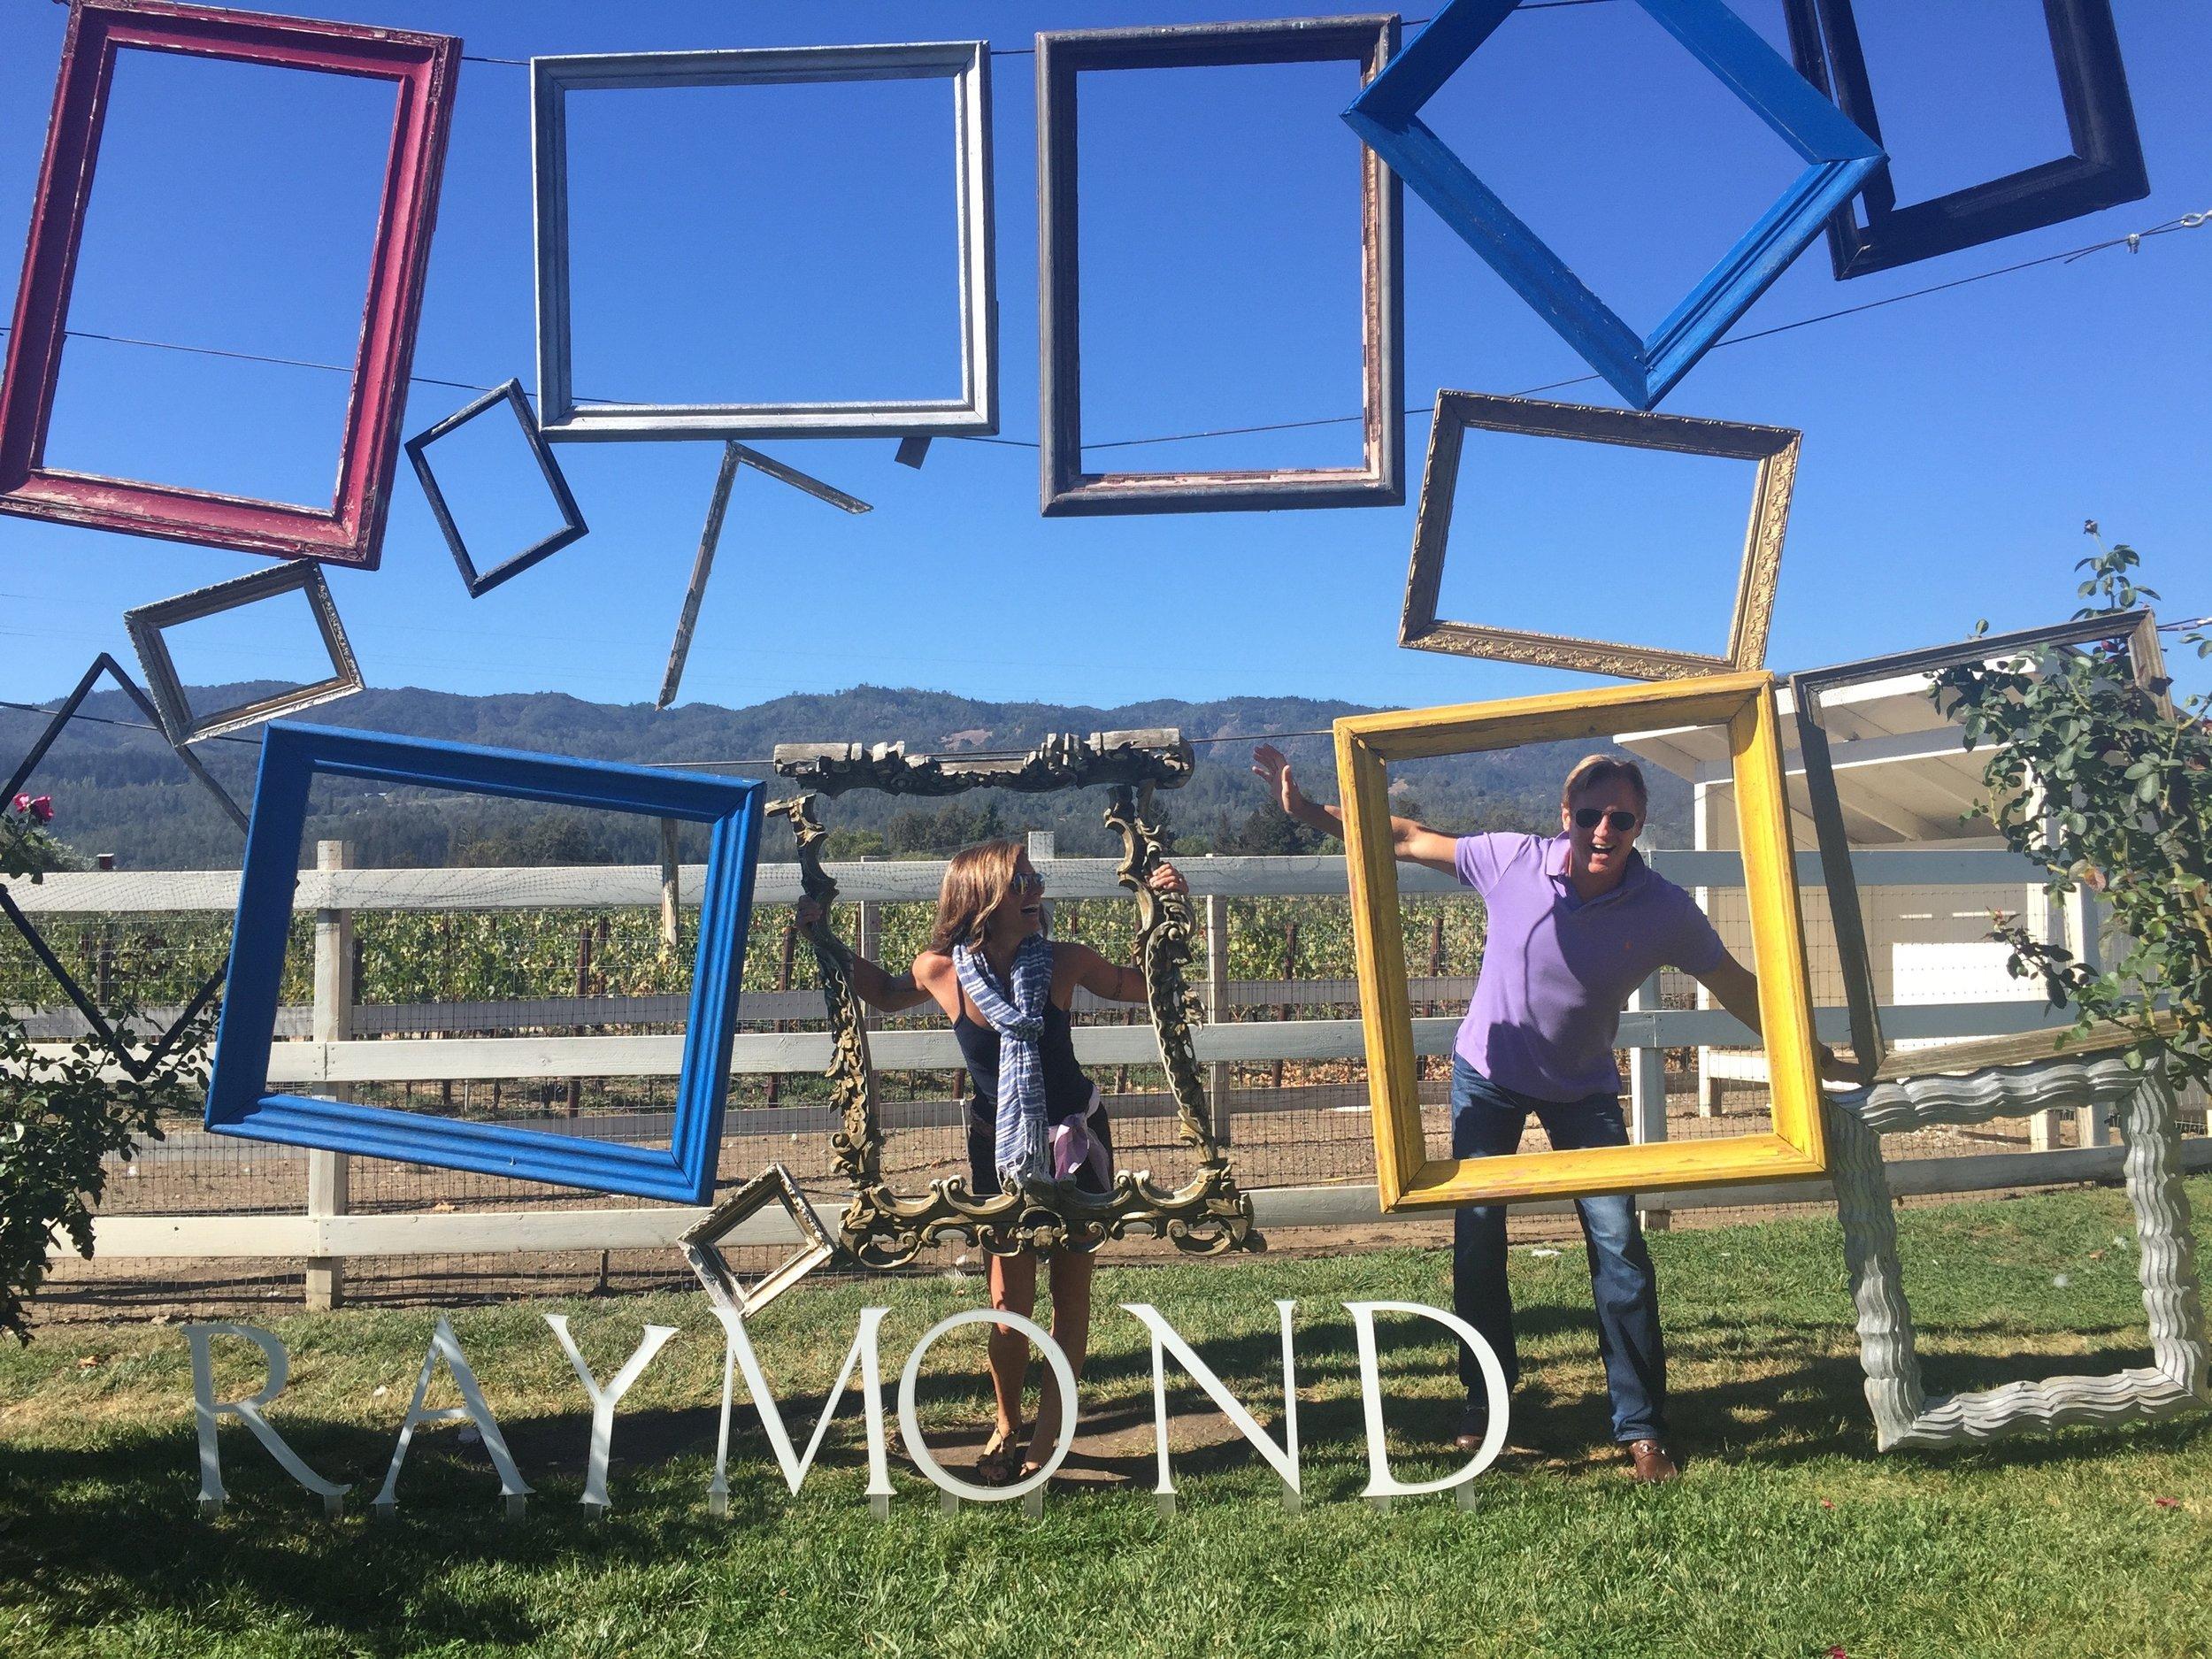 Raymond Vineyards